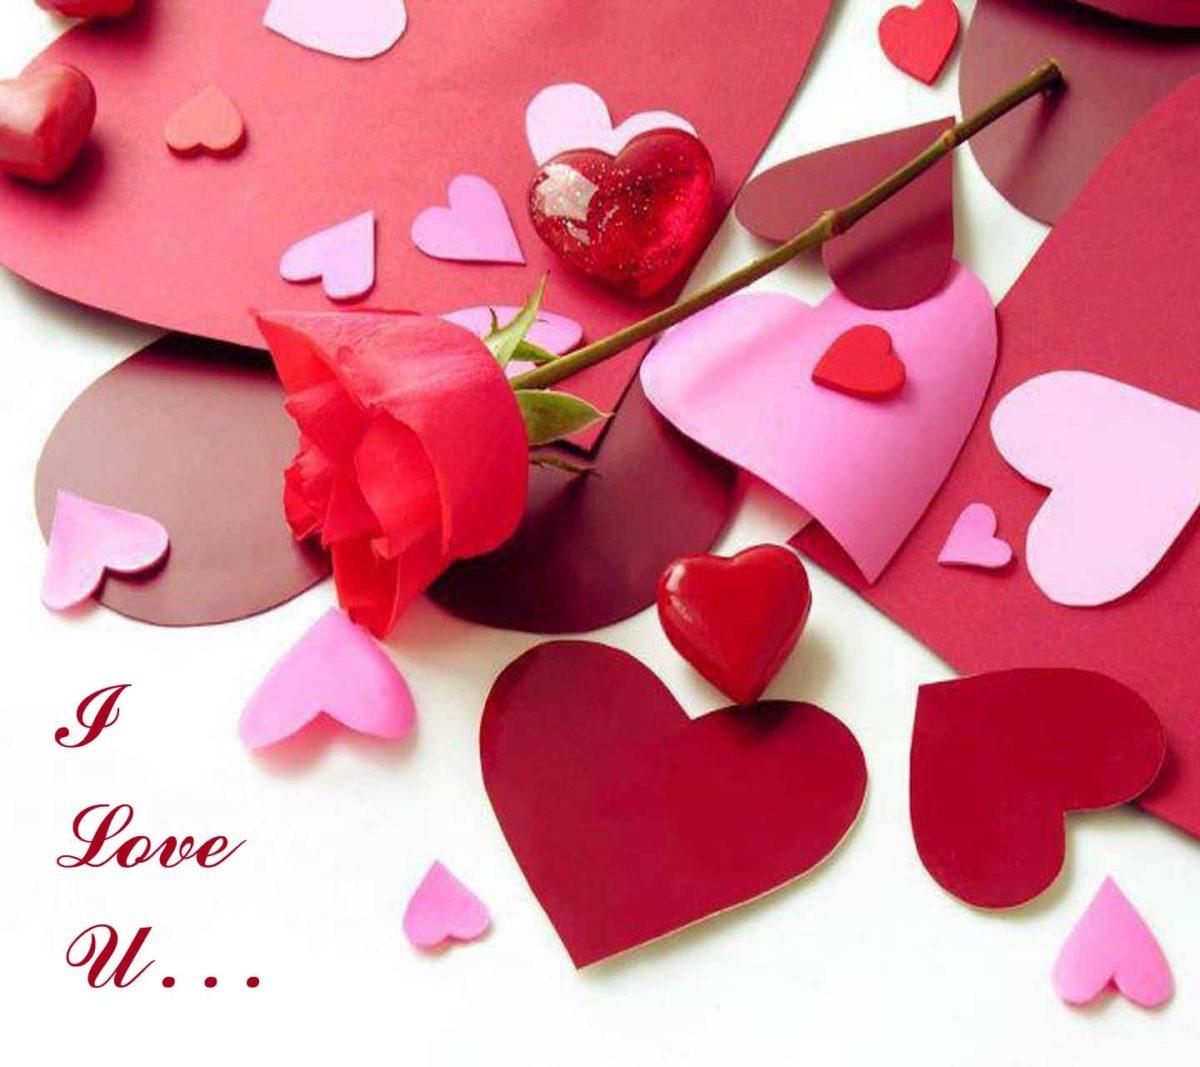 Love U | Love Wallpaper